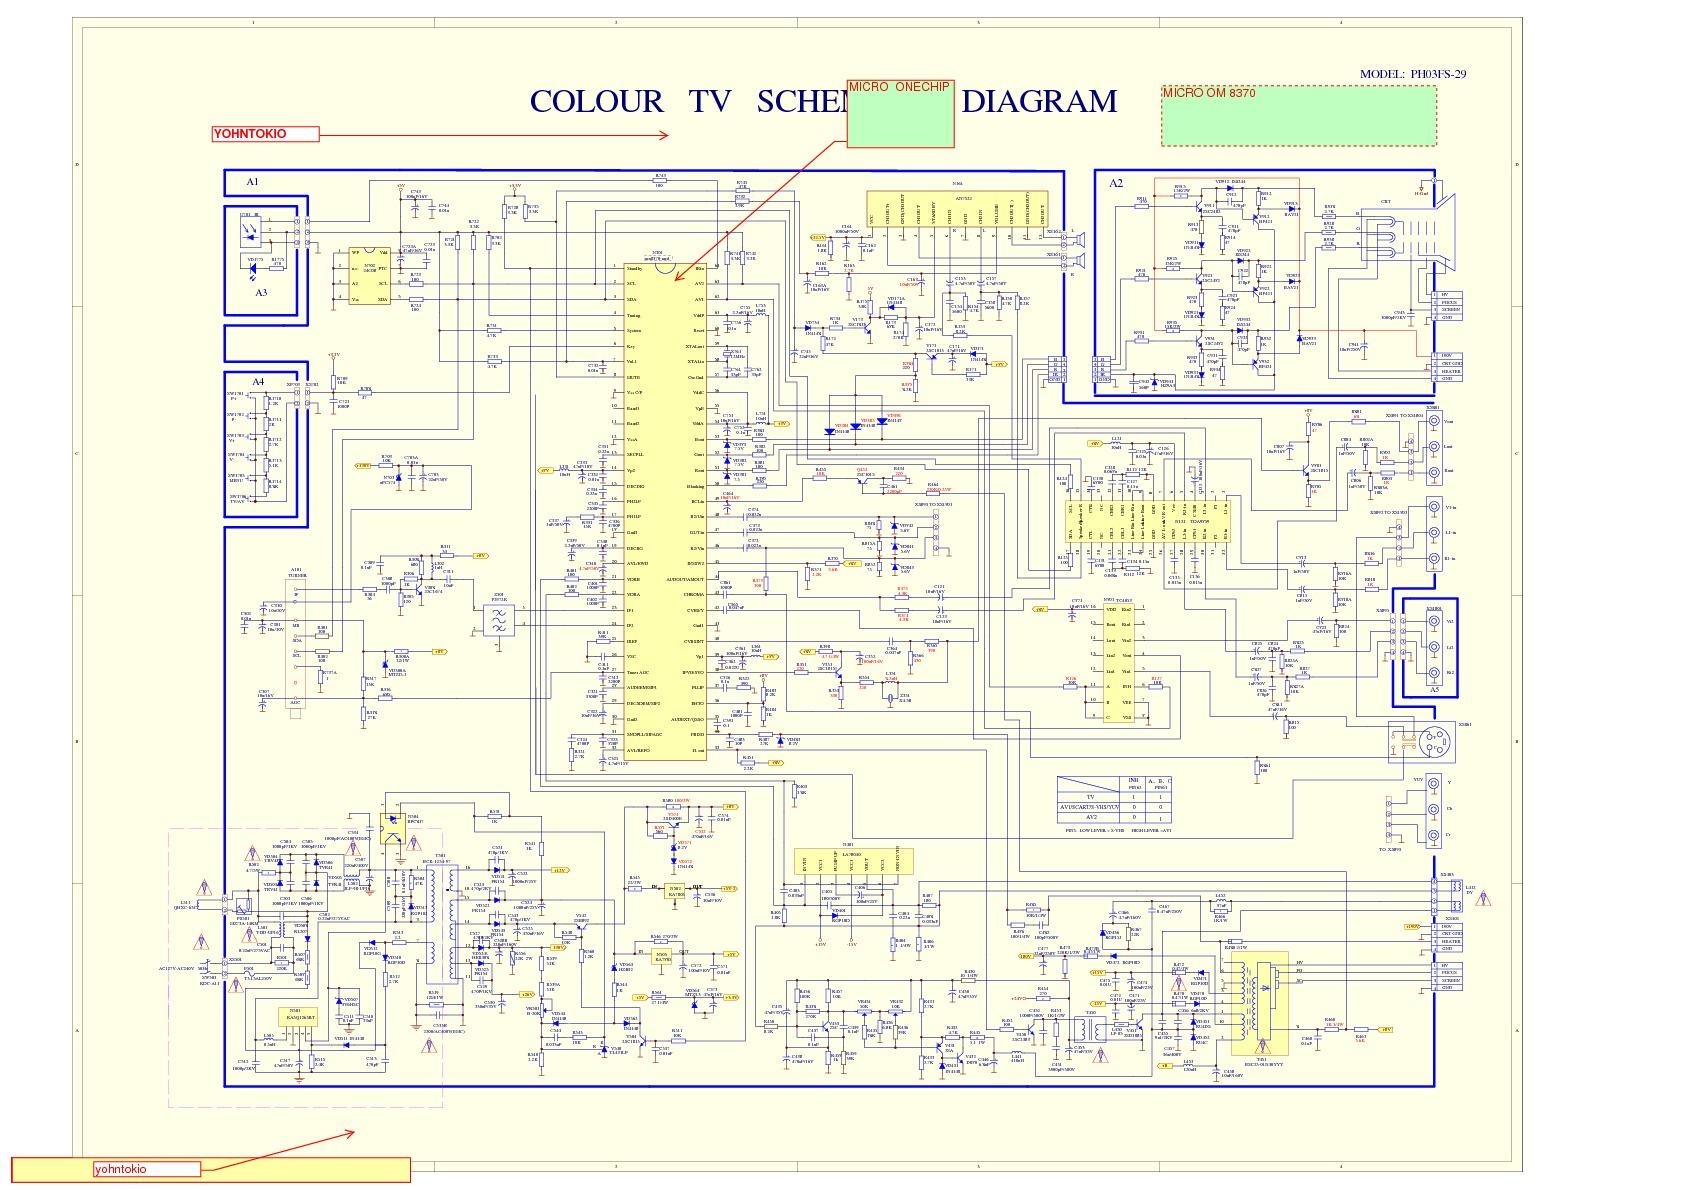 sankey-PH03FS-21%2C29.pdf